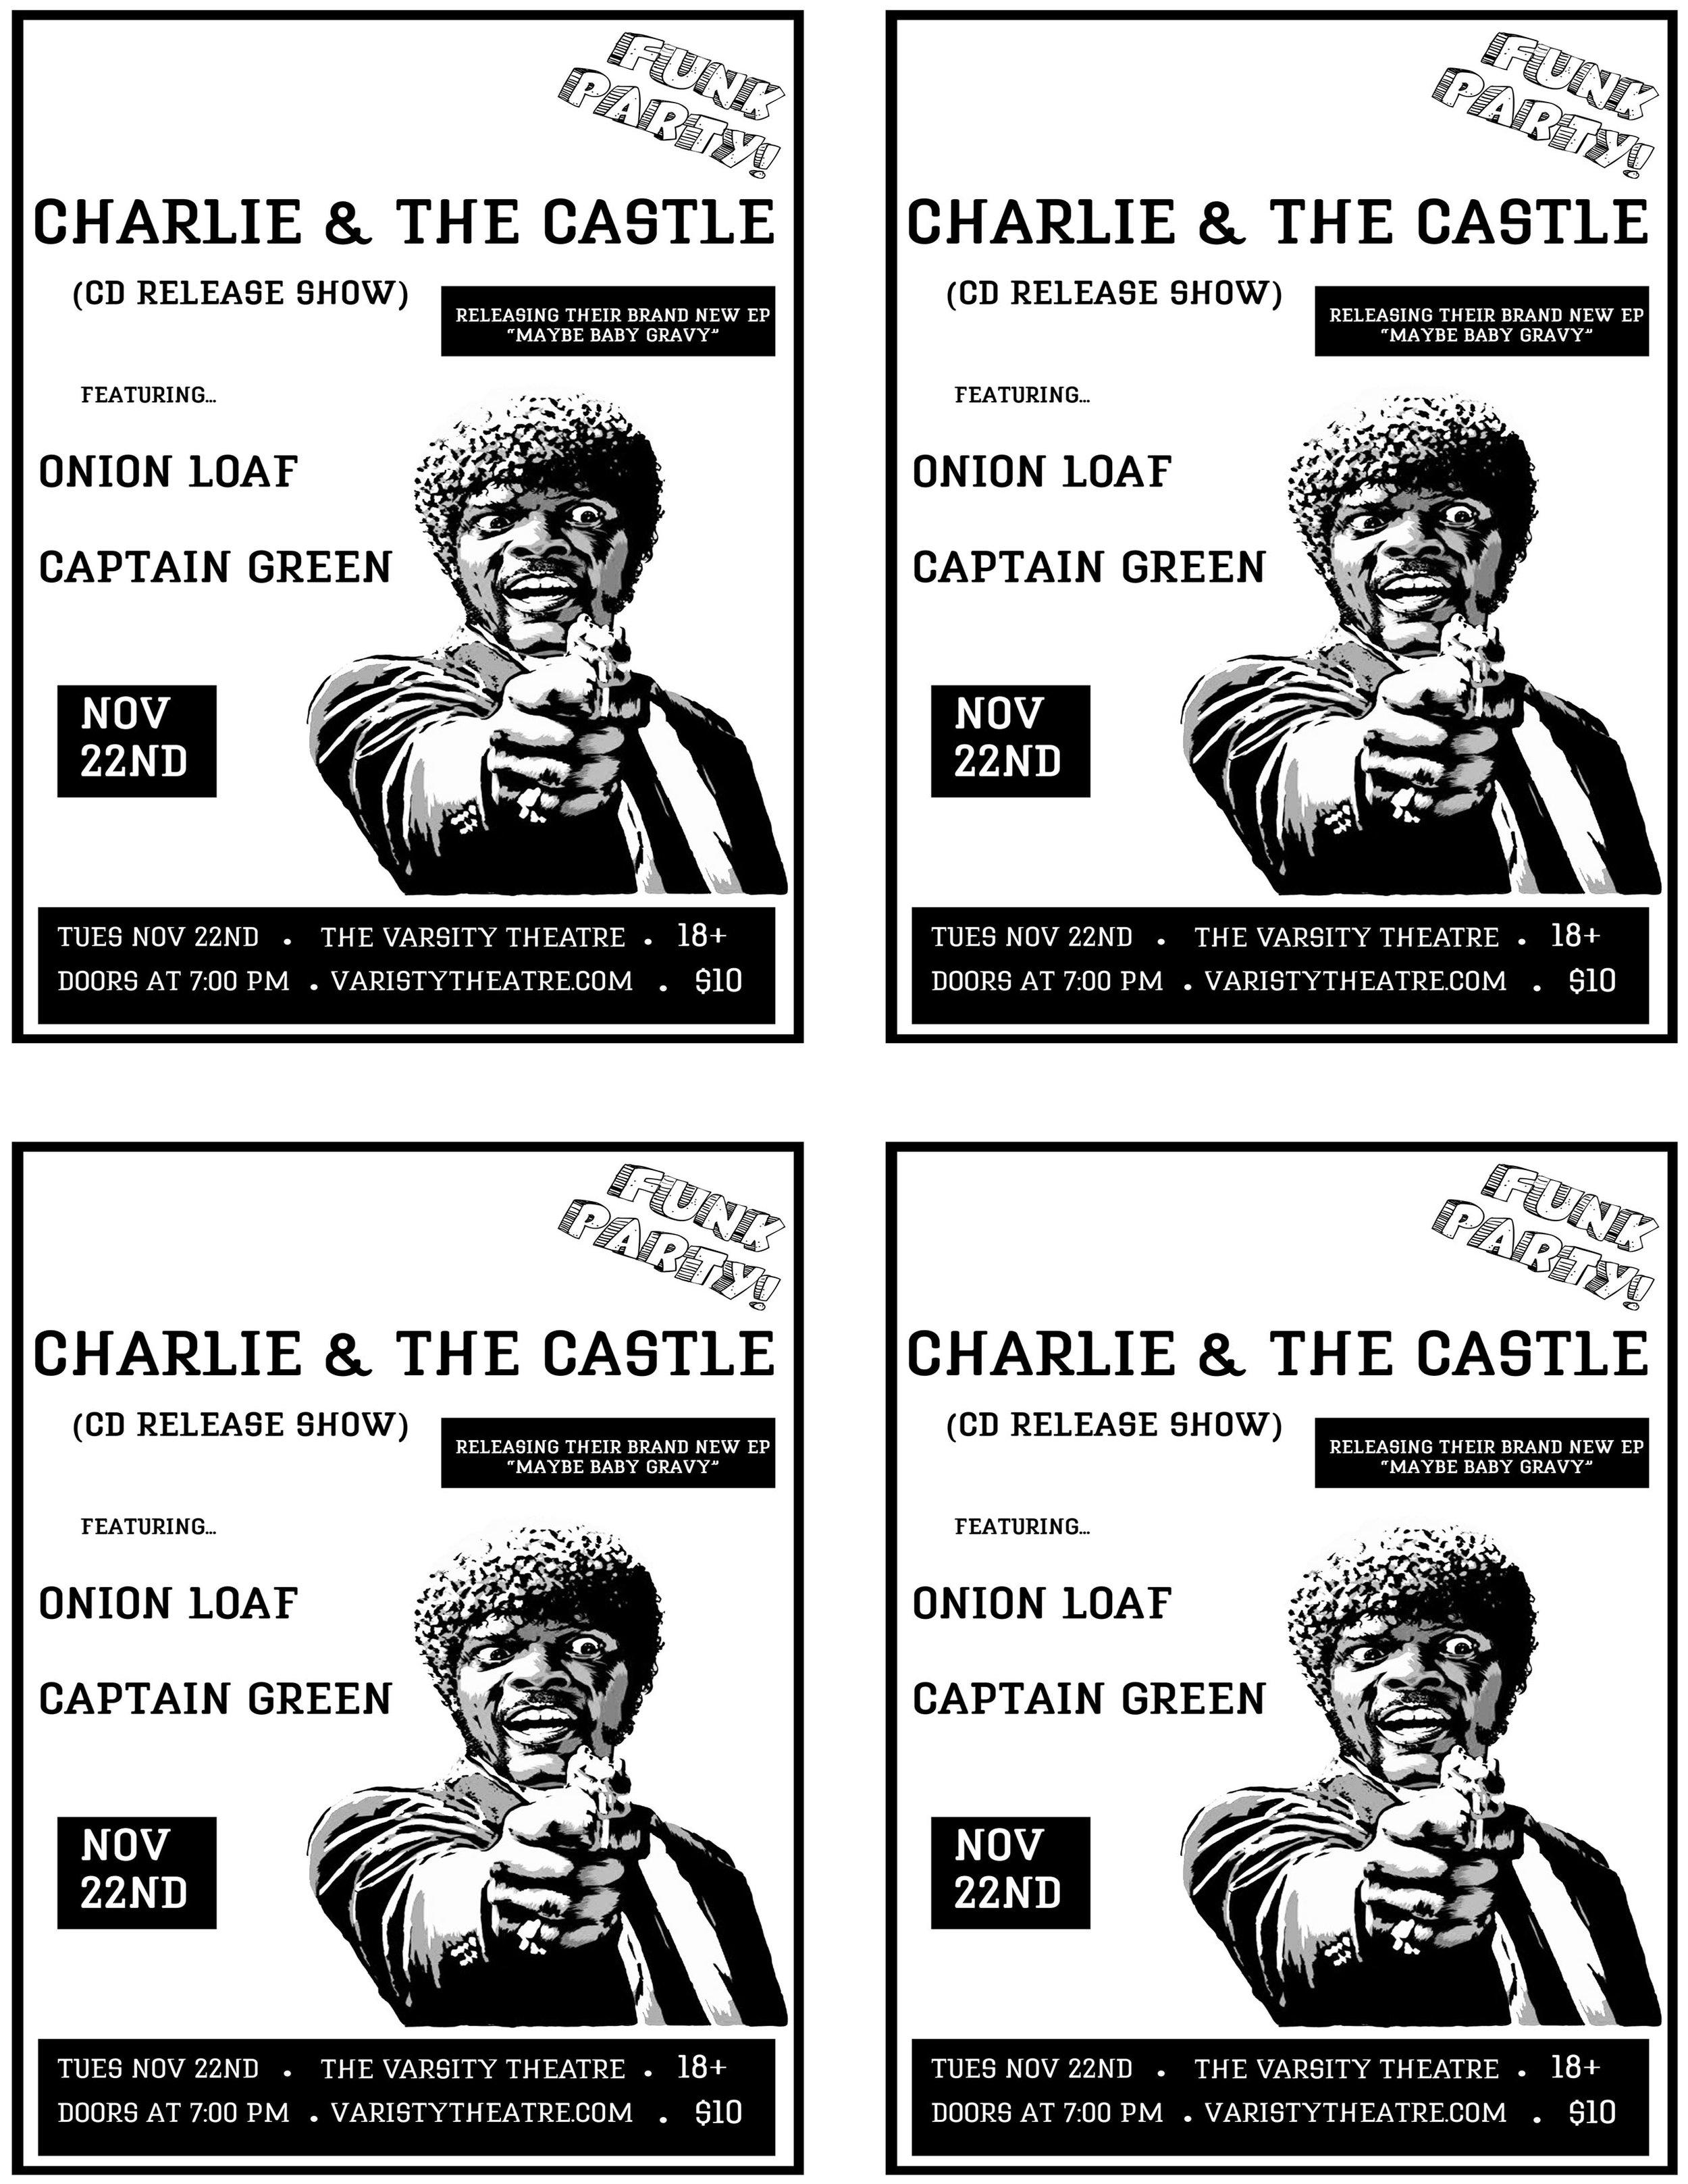 Promotional handbills